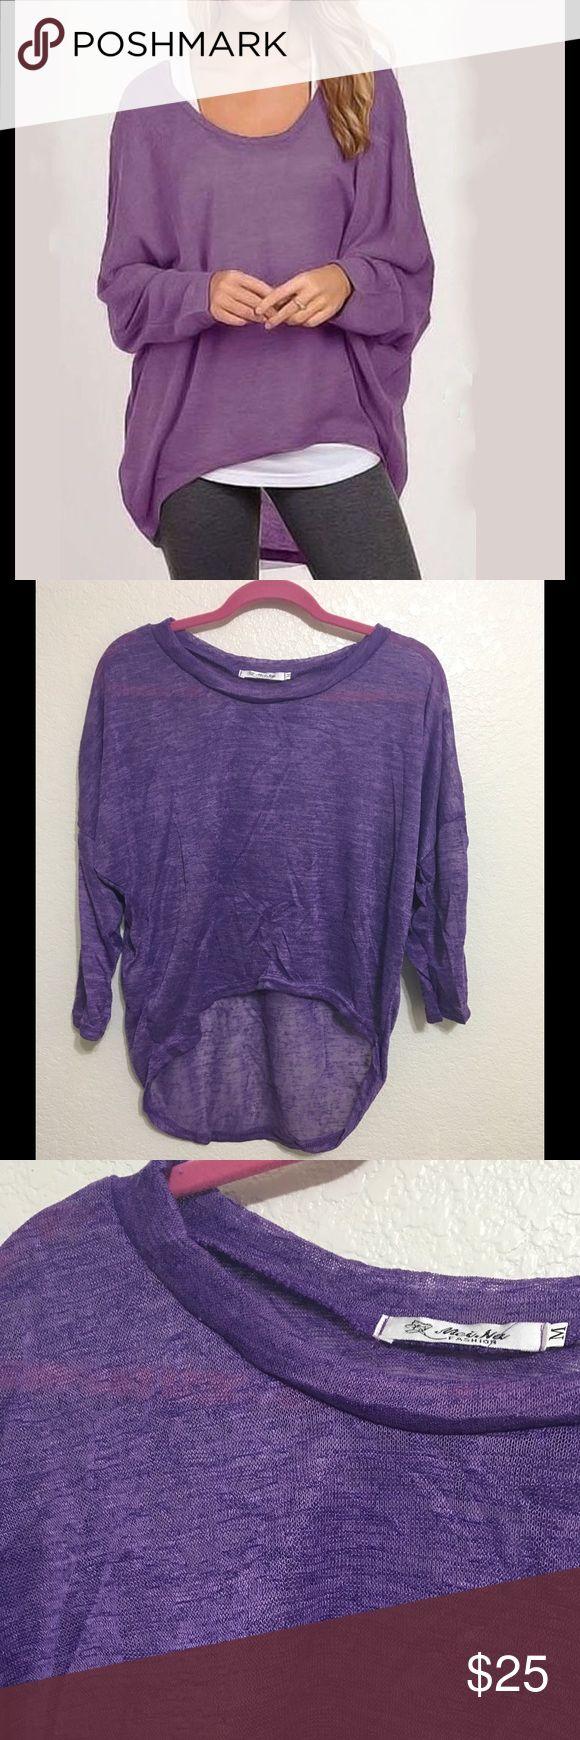 Shirt design measurements - Purple Fall Long Sleeve Loose Top Boutique